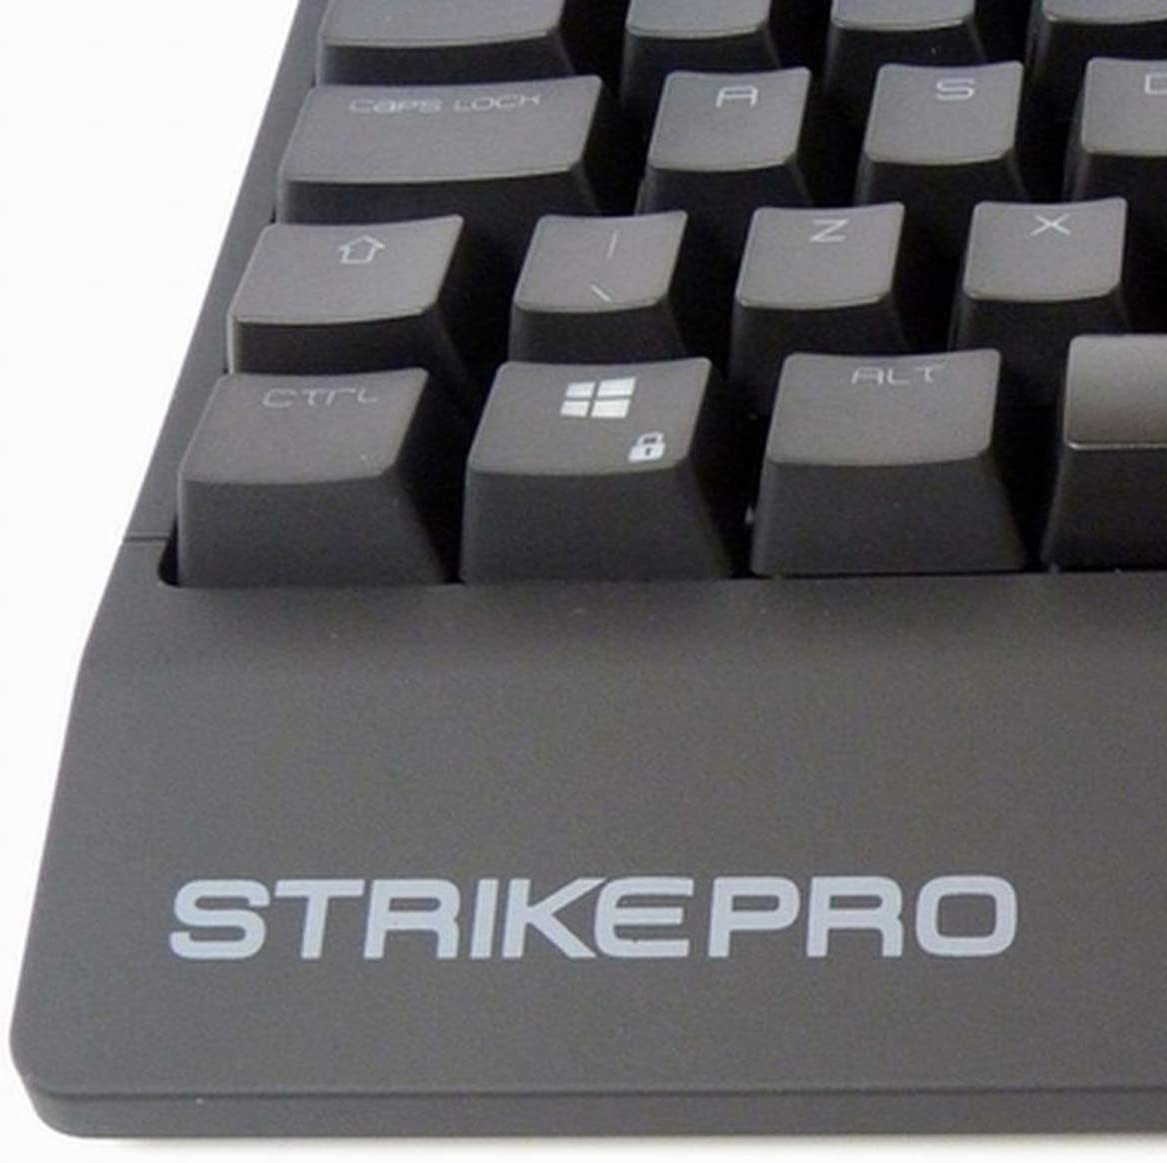 OZONE STRIKE PRO US CHERRY MX RED Keyboard: Amazon.es ...